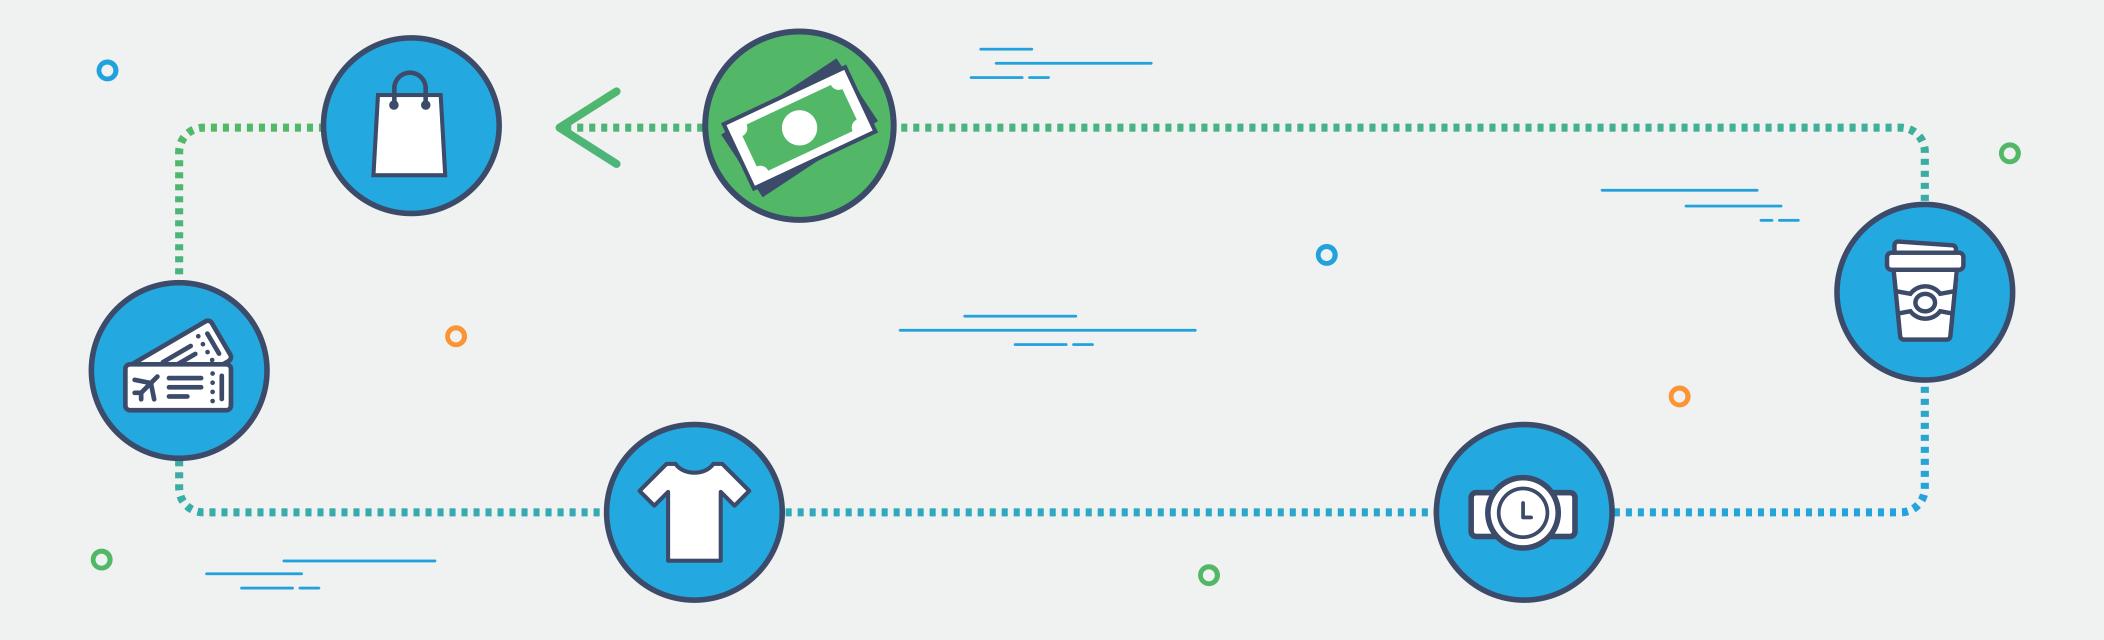 credit card life cycle pdf